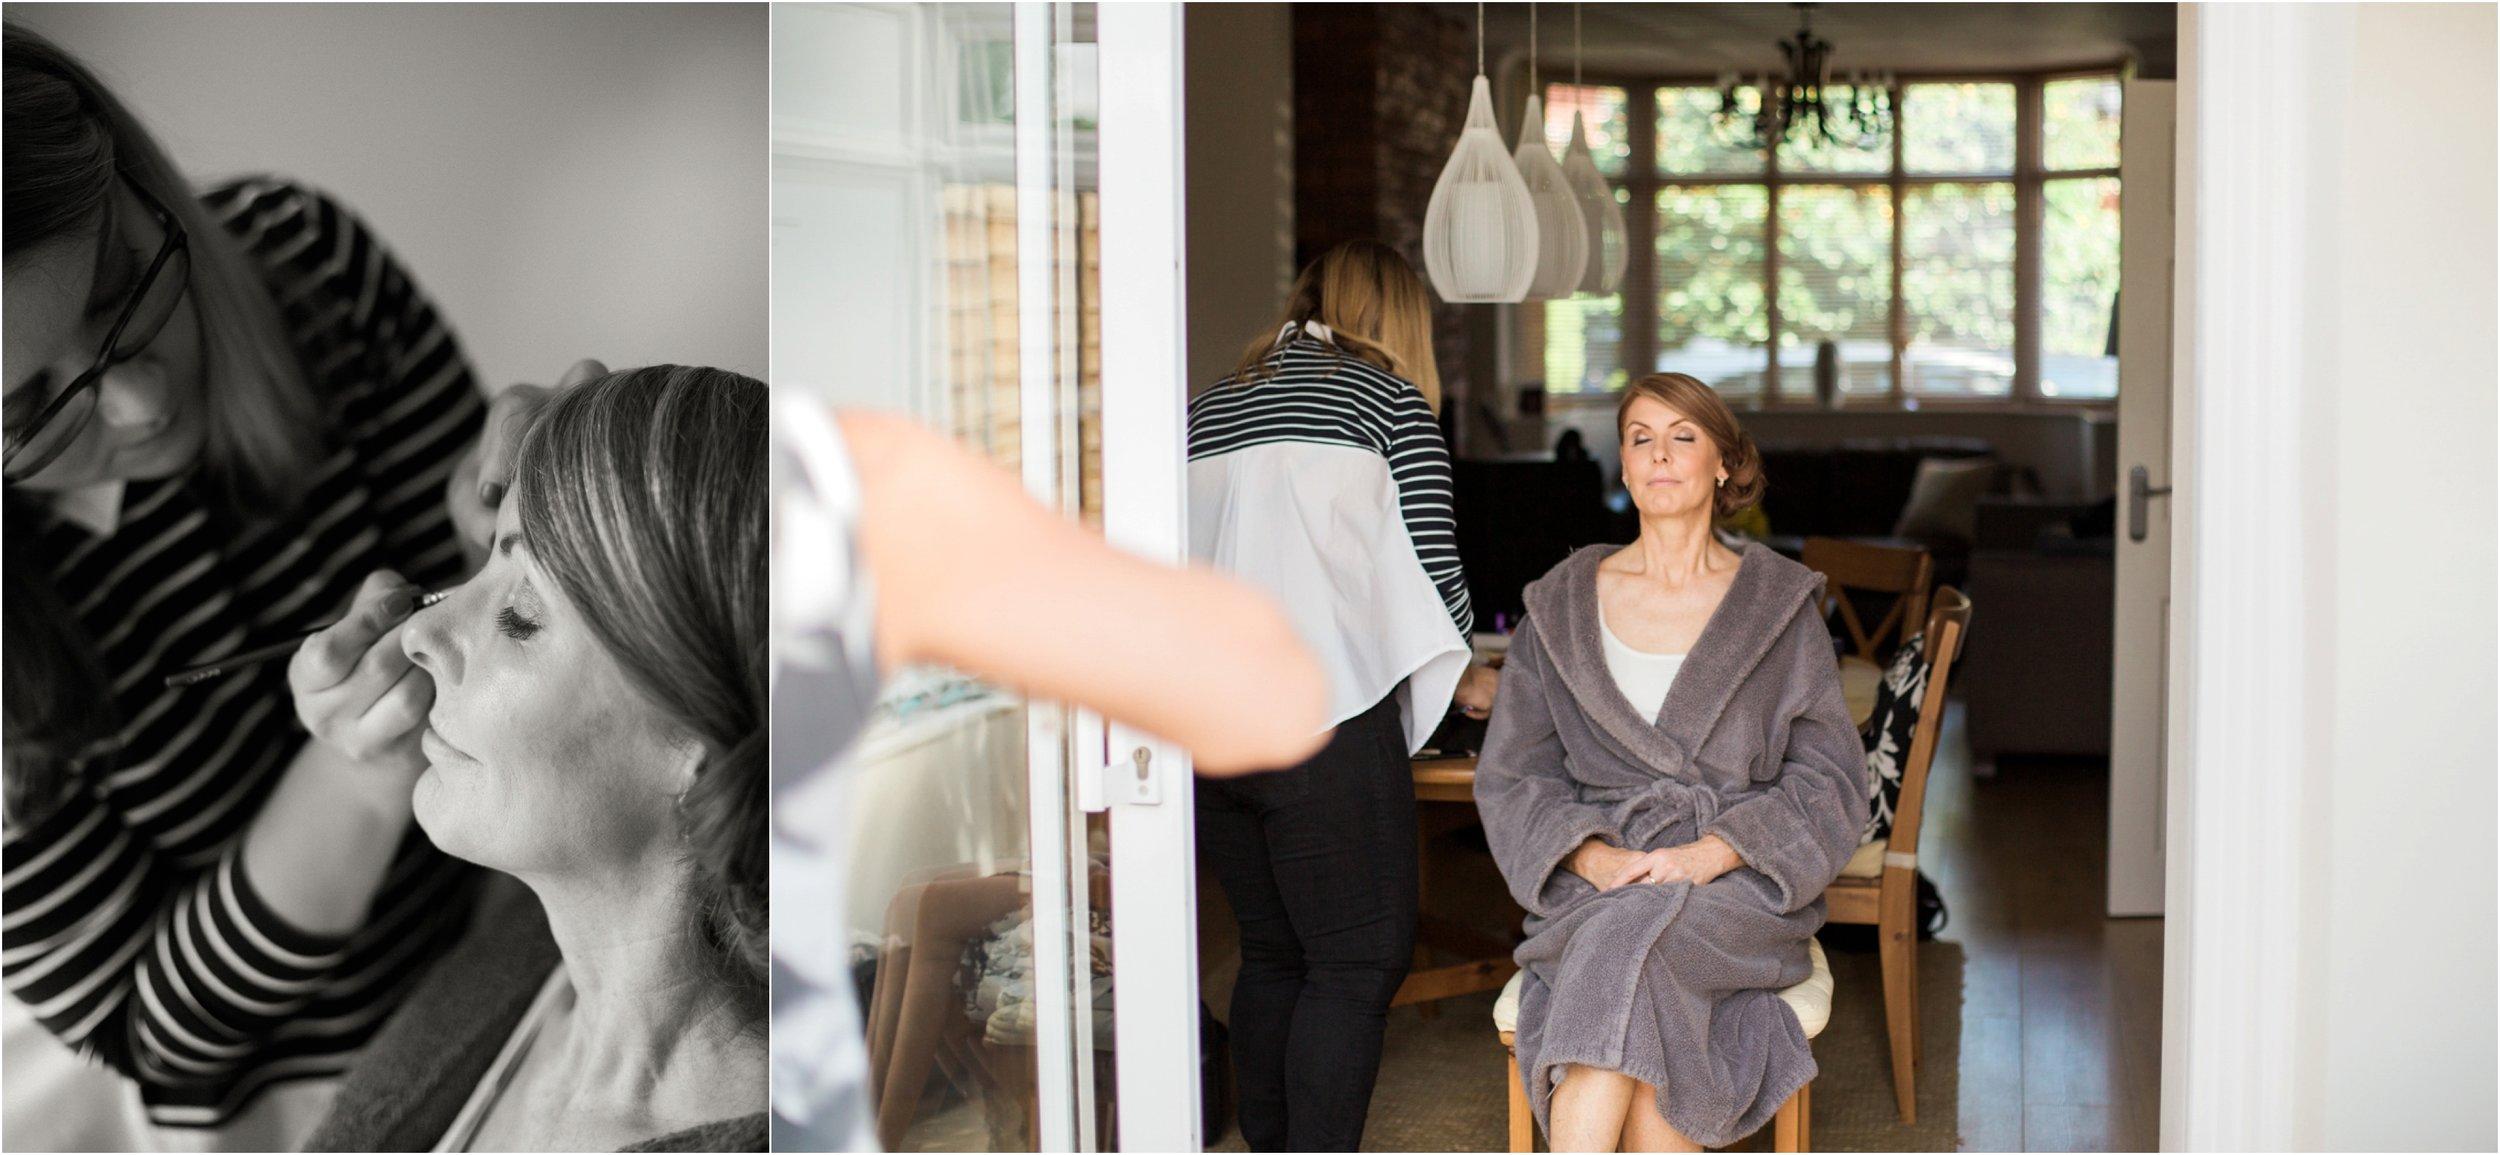 Sophie Evans Photography, Claire & John, Swallows Nest Barn Wedding, Warwickshire Wedding Photographer-7.jpg